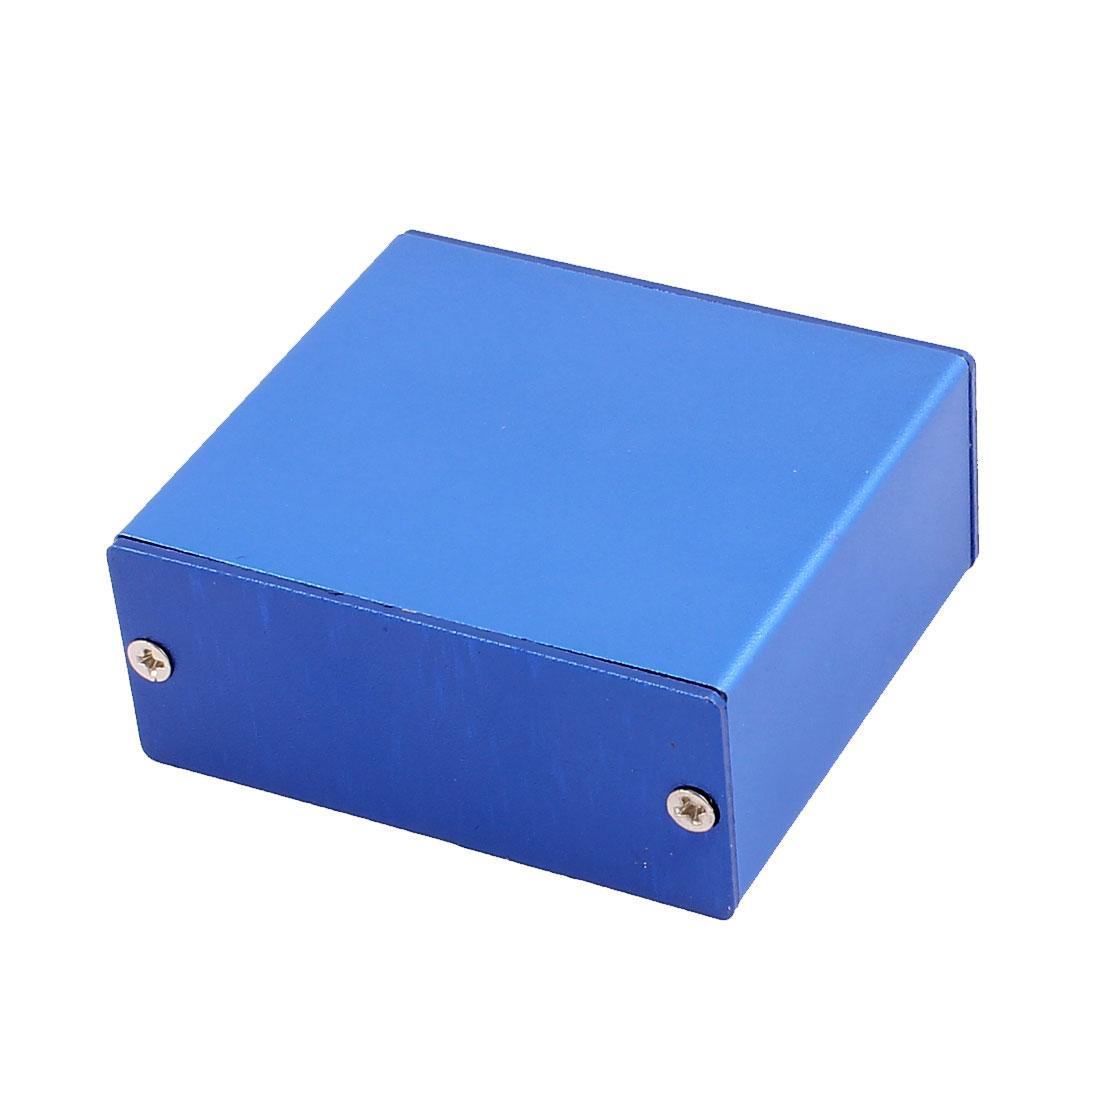 58 x 53 x 24mm Multi-purpose Extruded Aluminum Enclosure Electronic Box Blue